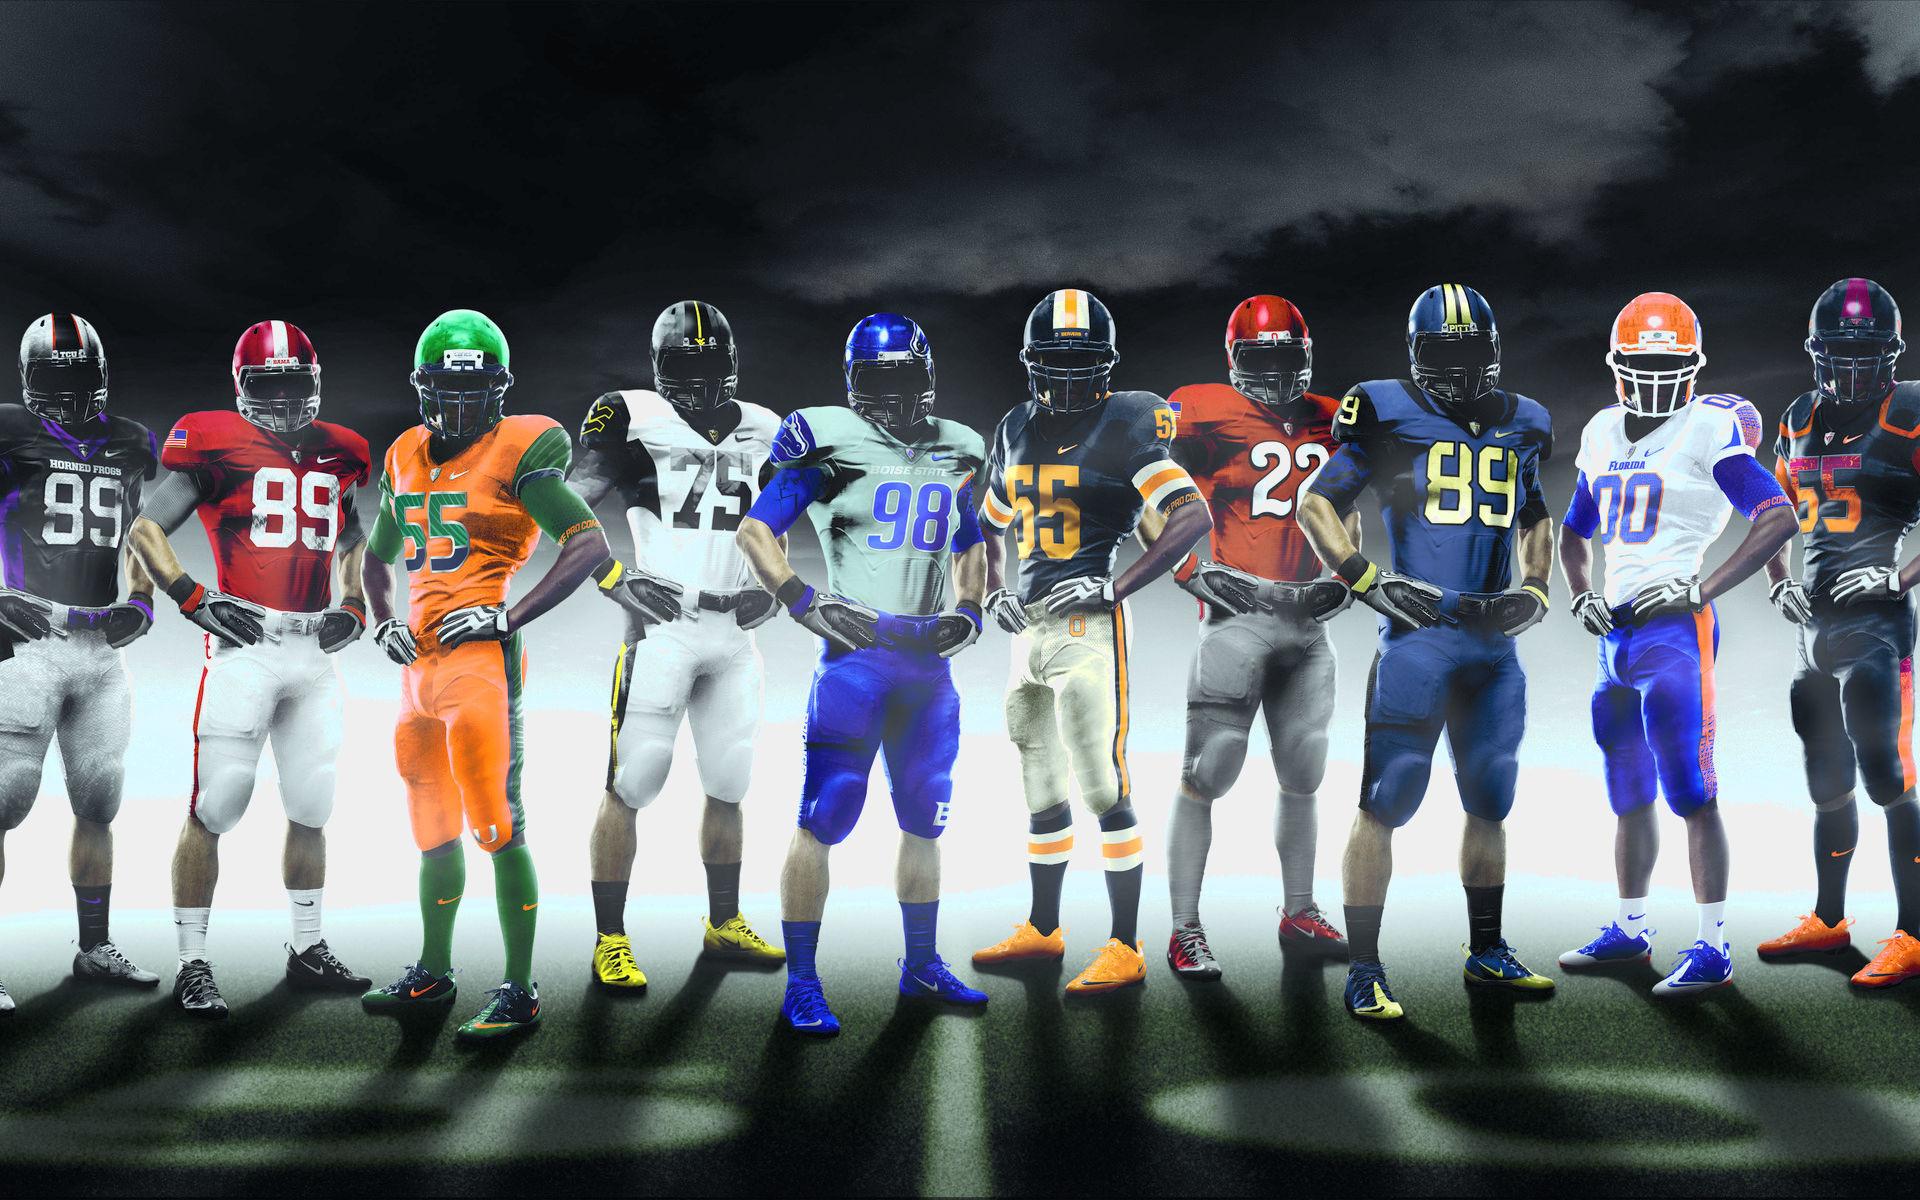 10 Most Popular Cool American Football Backgrounds Full Hd: Florida Gators Wallpaper And Screensavers (67+ Images